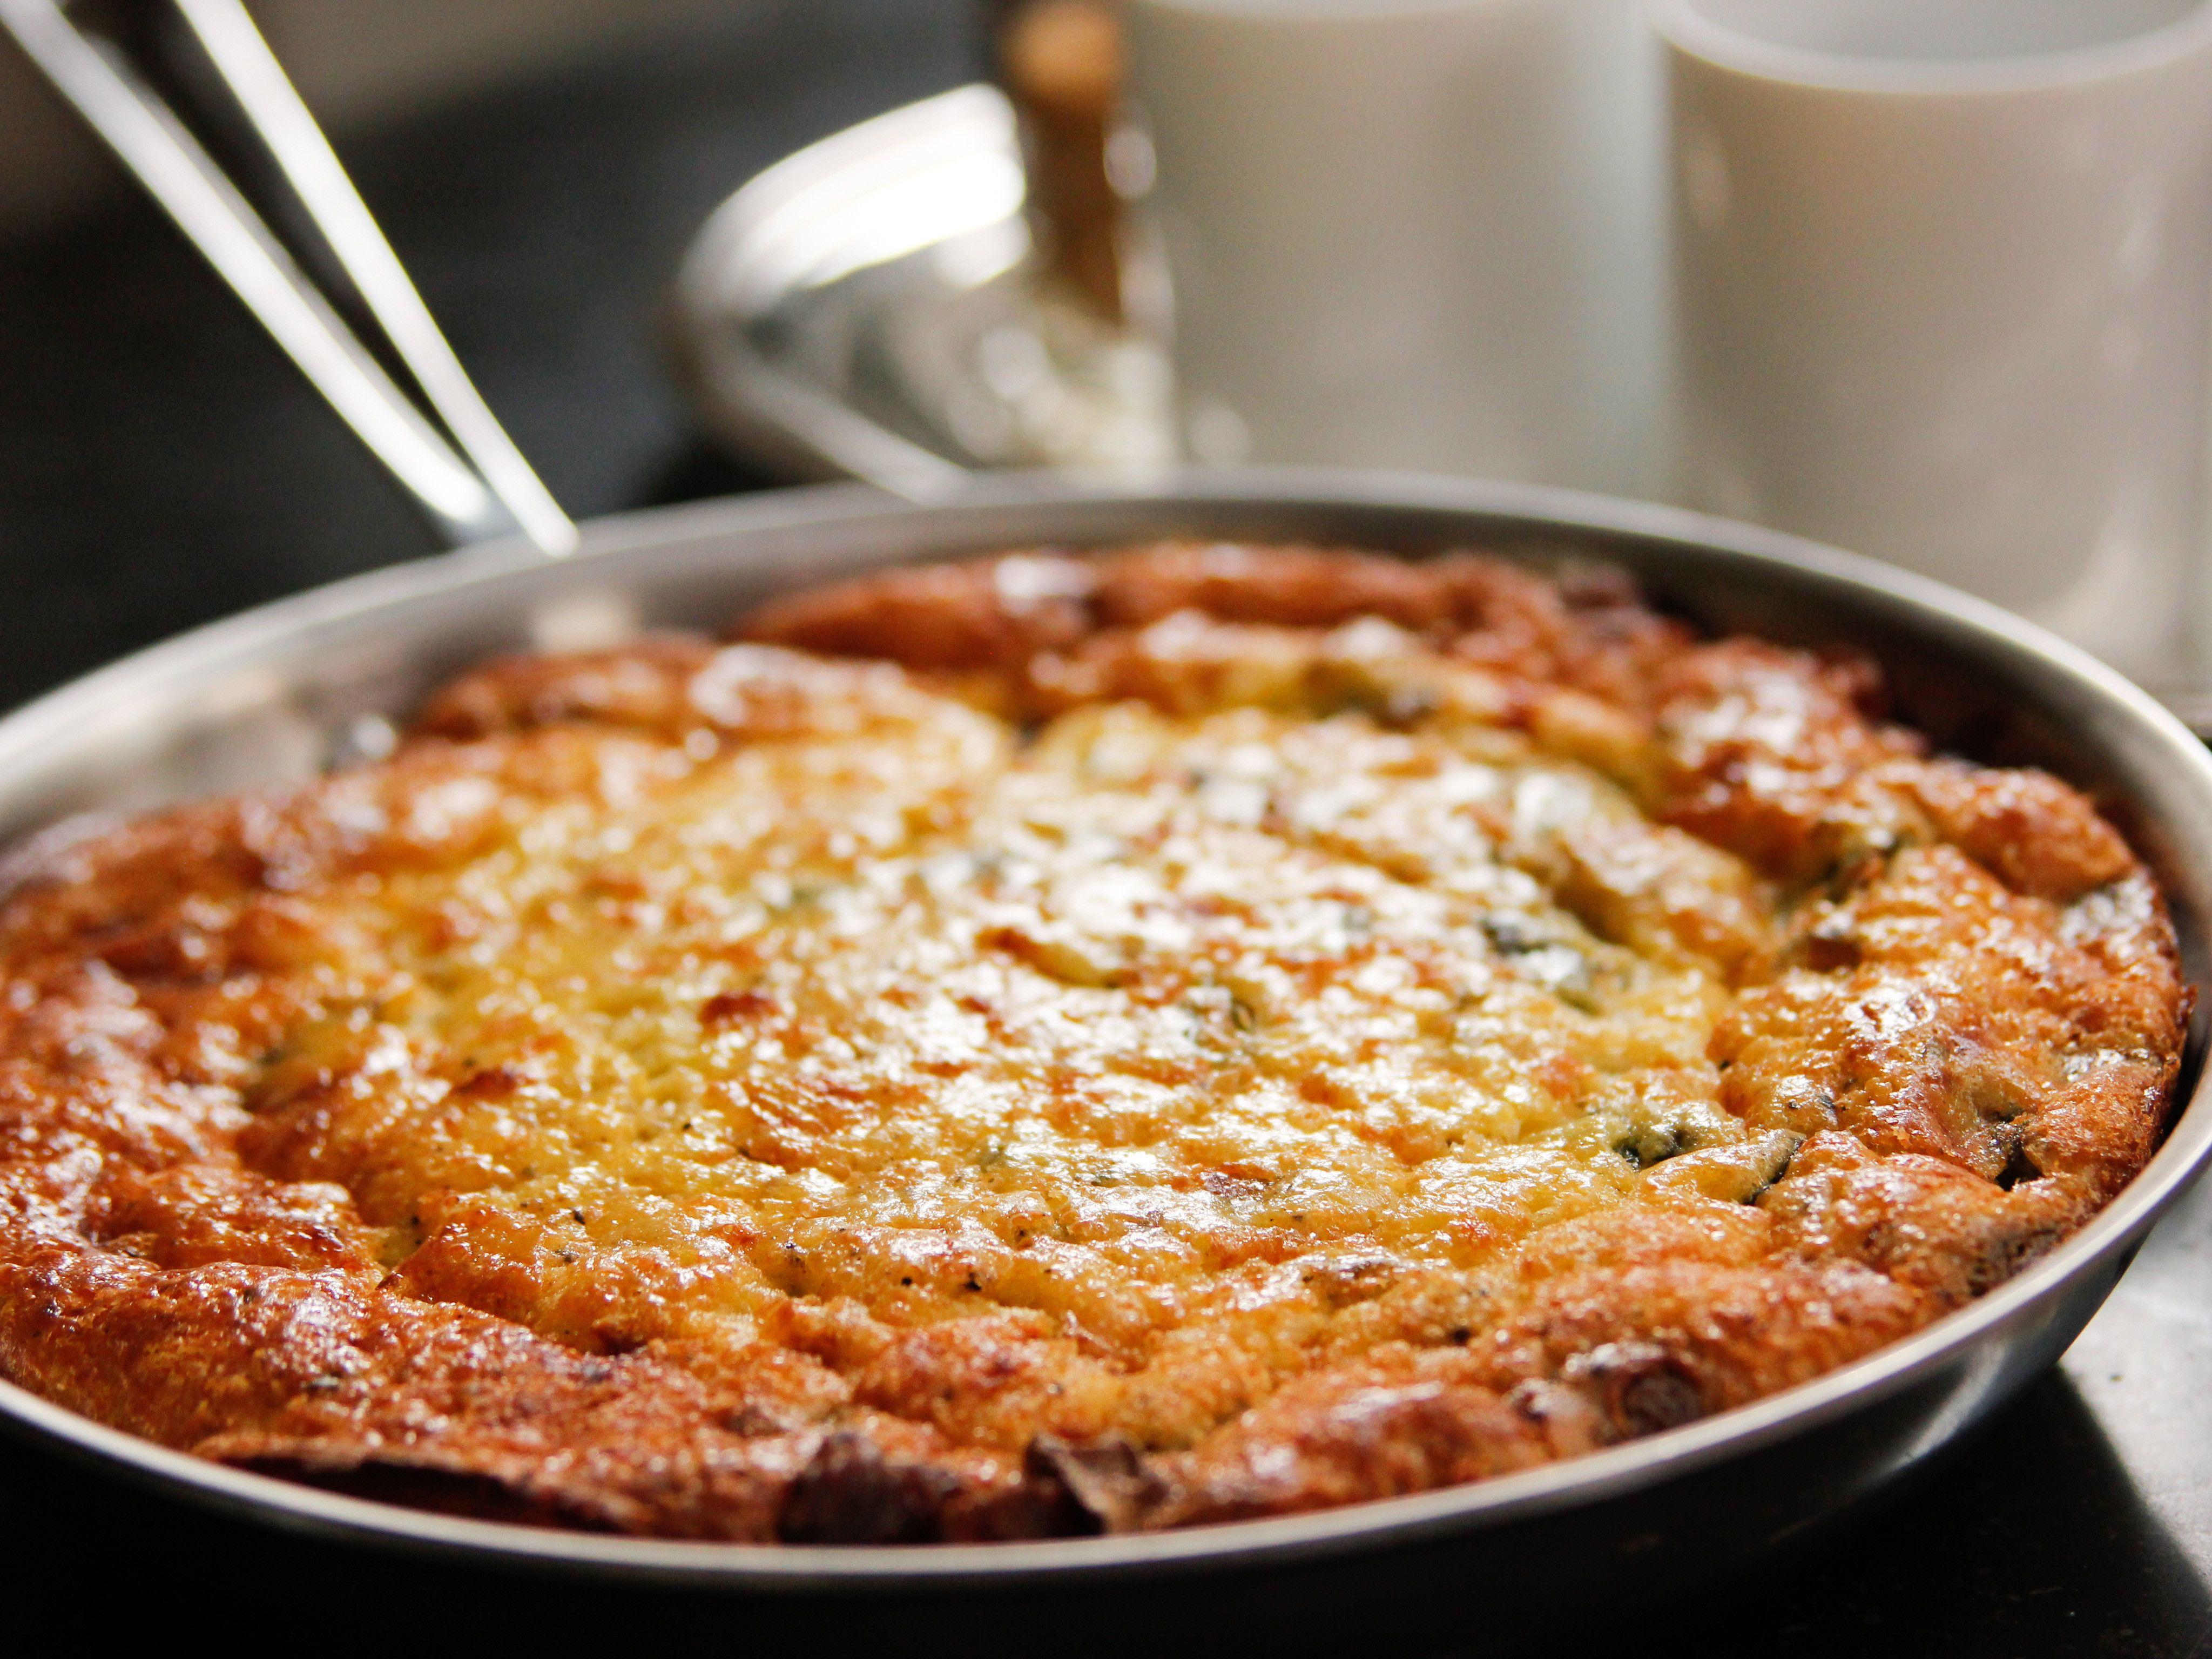 Potato pancetta frittata recipe frittata brunch and barefoot potato pancetta frittata ina garten food network forumfinder Image collections